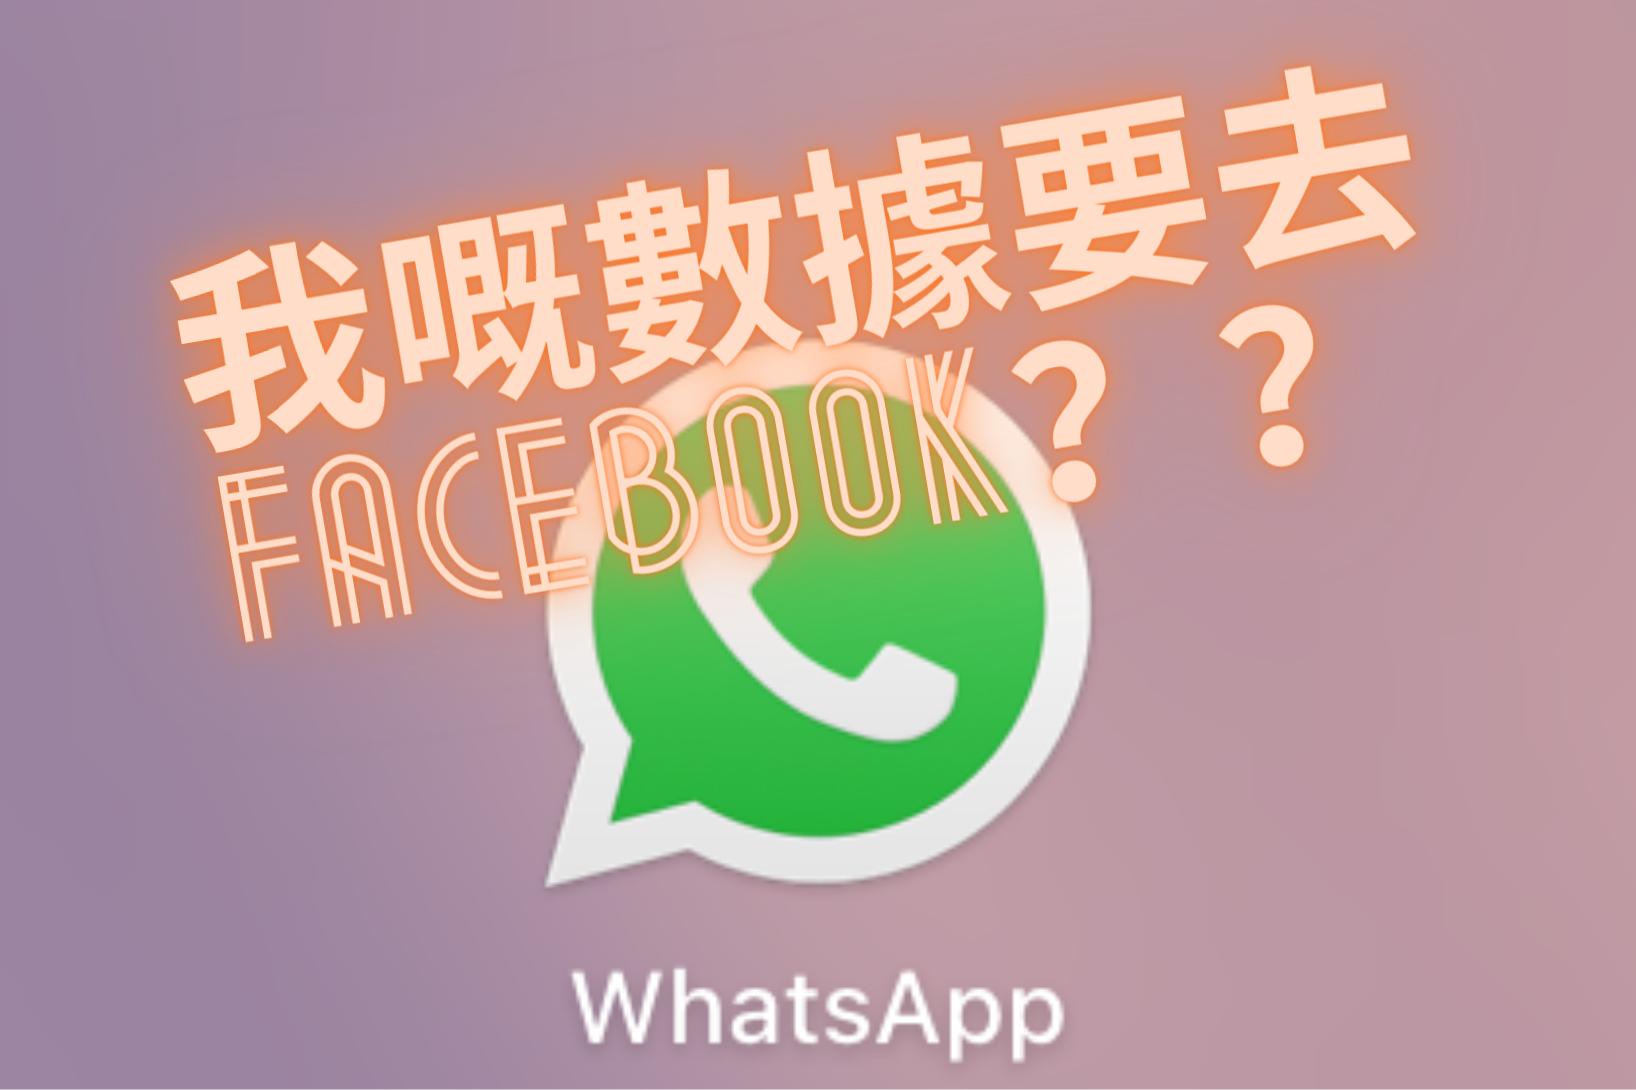 WhatsApp修改私隱條款,將與Facebook分享數據。(本文記者製圖)